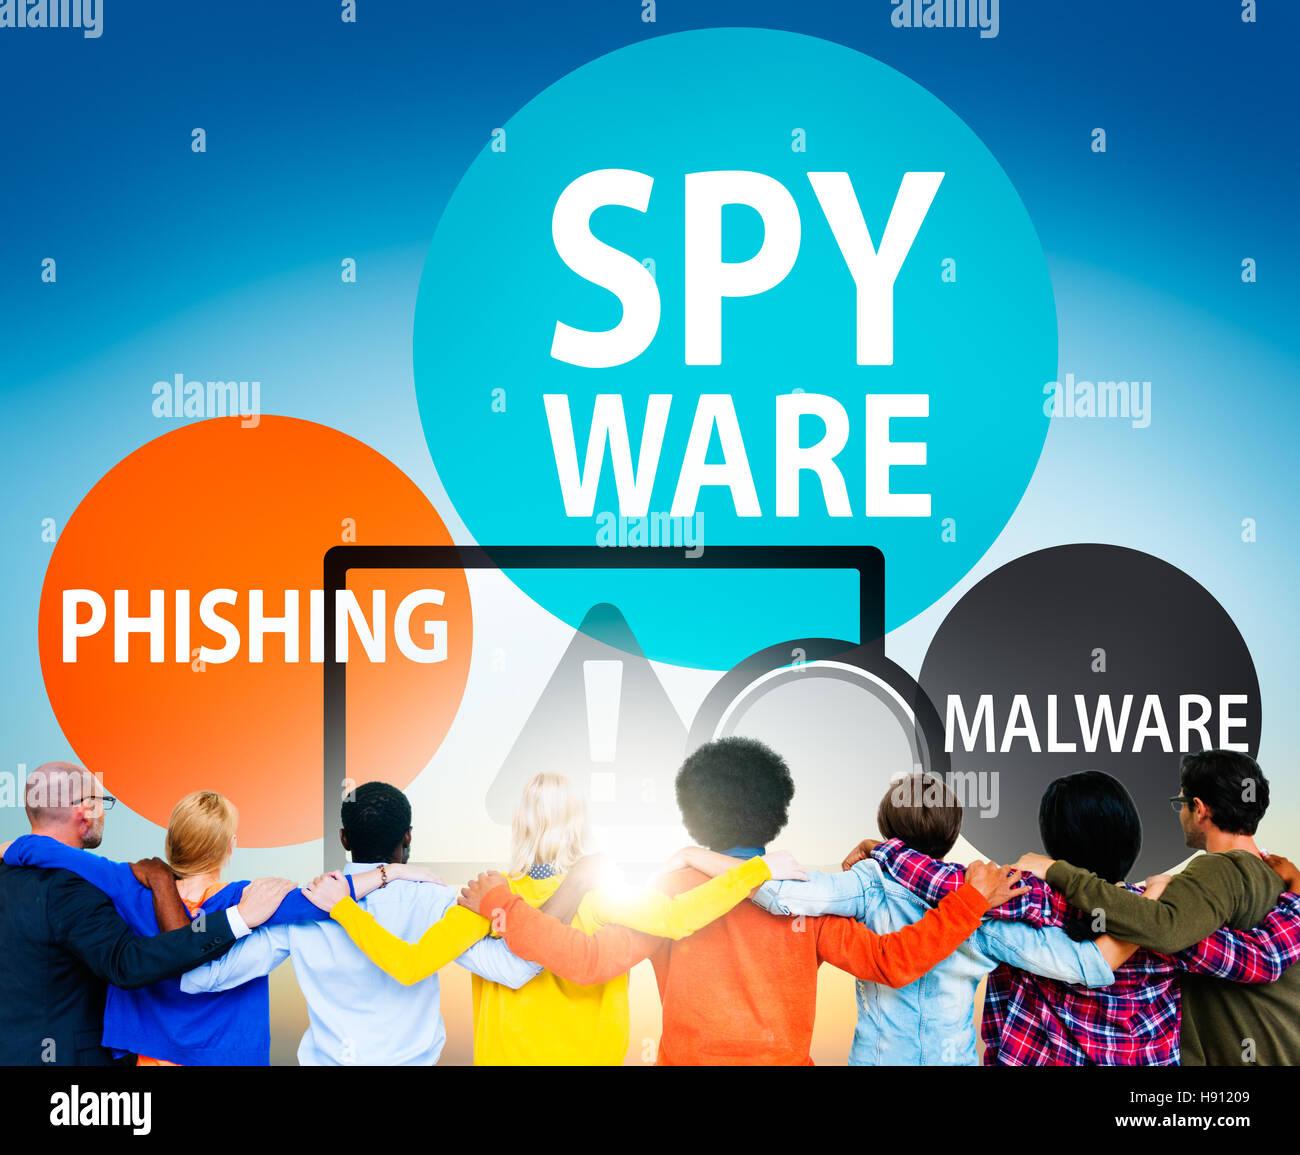 Spyware Hacking Phishing Malware Virus Concept - Stock Image